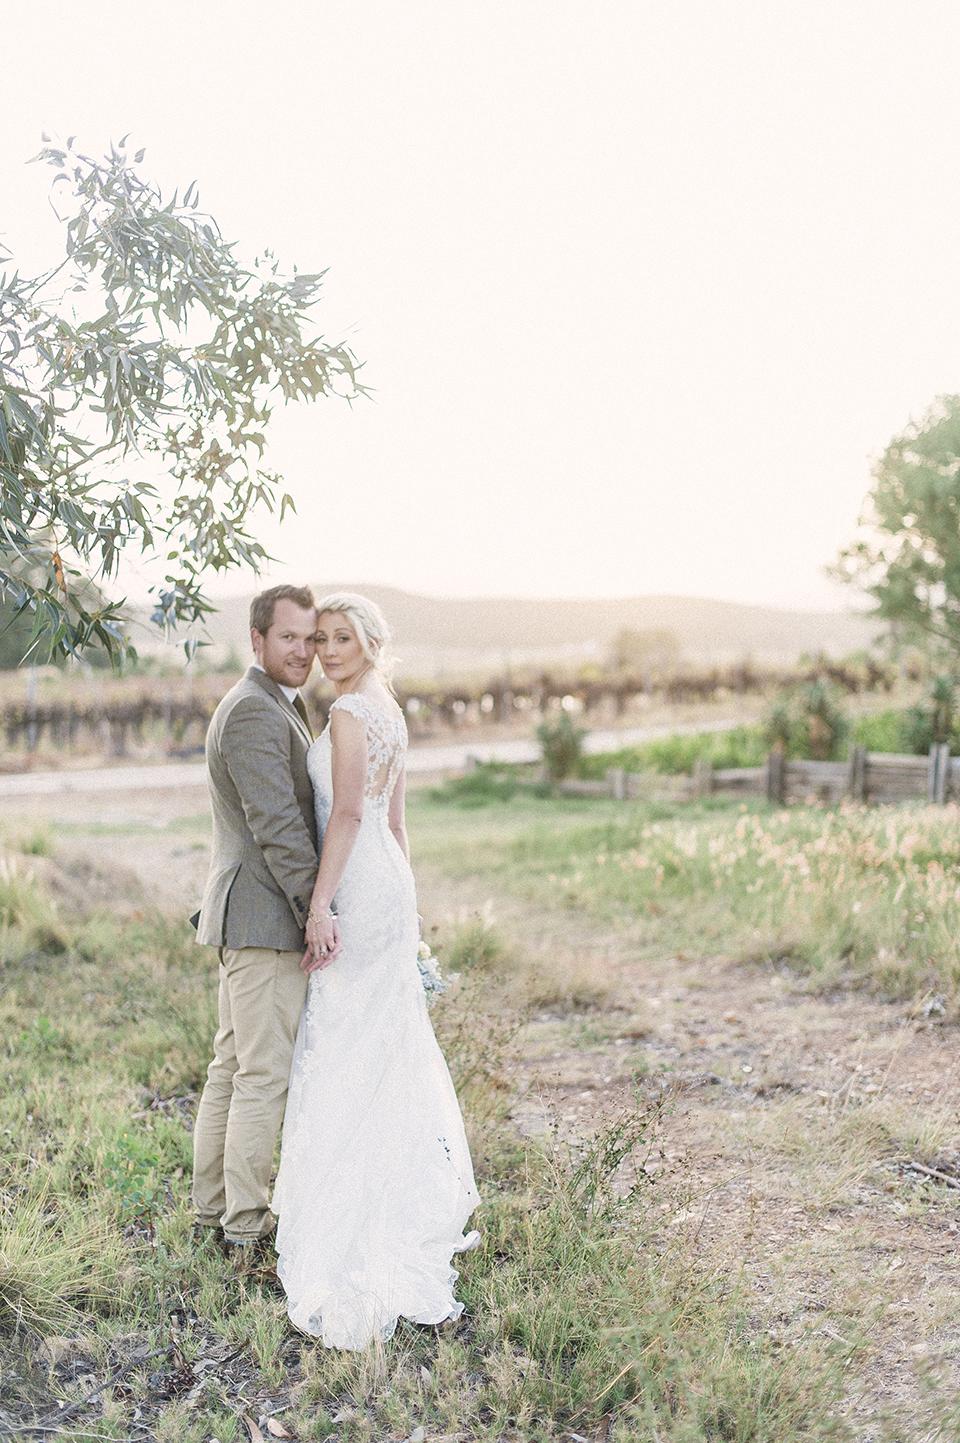 RyanParker_WeddingPhotographer_FineArt_CapeTown_Robertson_PatBusch_Hermanus_M&S_DSC_3558.jpg